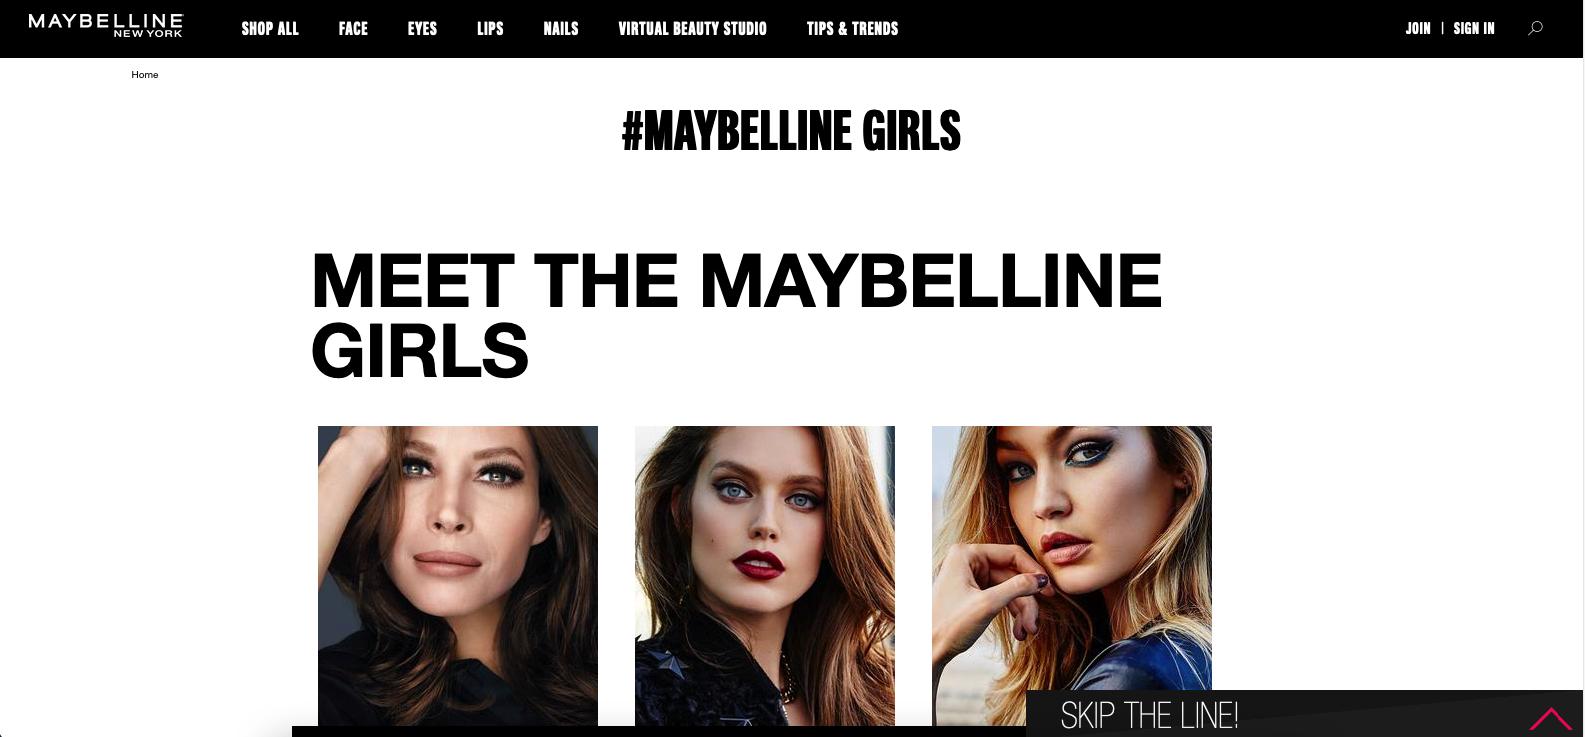 Maybelline brand ambassador program